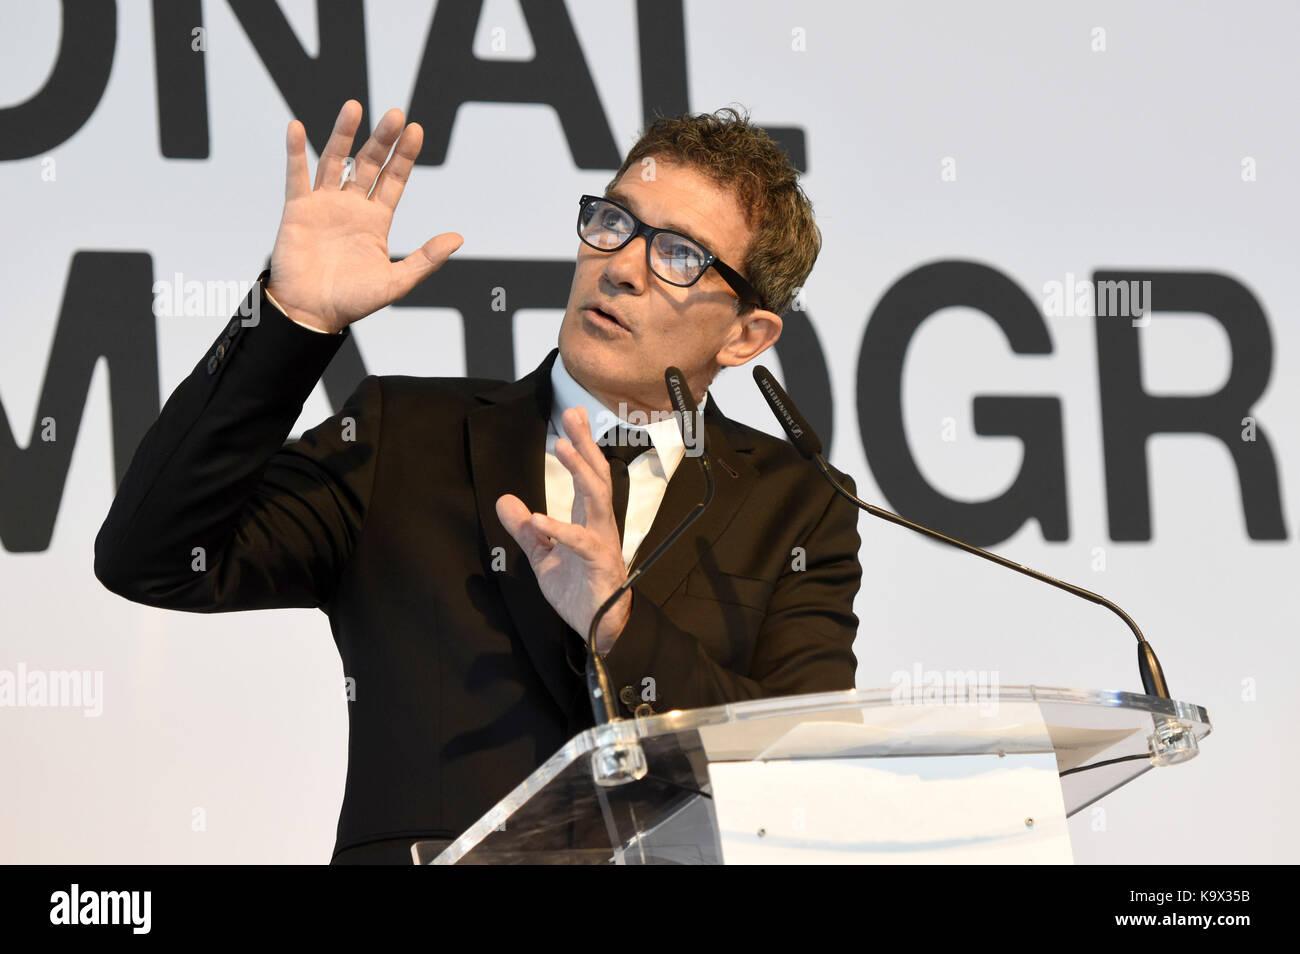 San sebastian, Spagna. 23 Sep, 2017. Antonio Banderas riceve il cinema nazionale premio durante il sessantacinquesimo Foto Stock